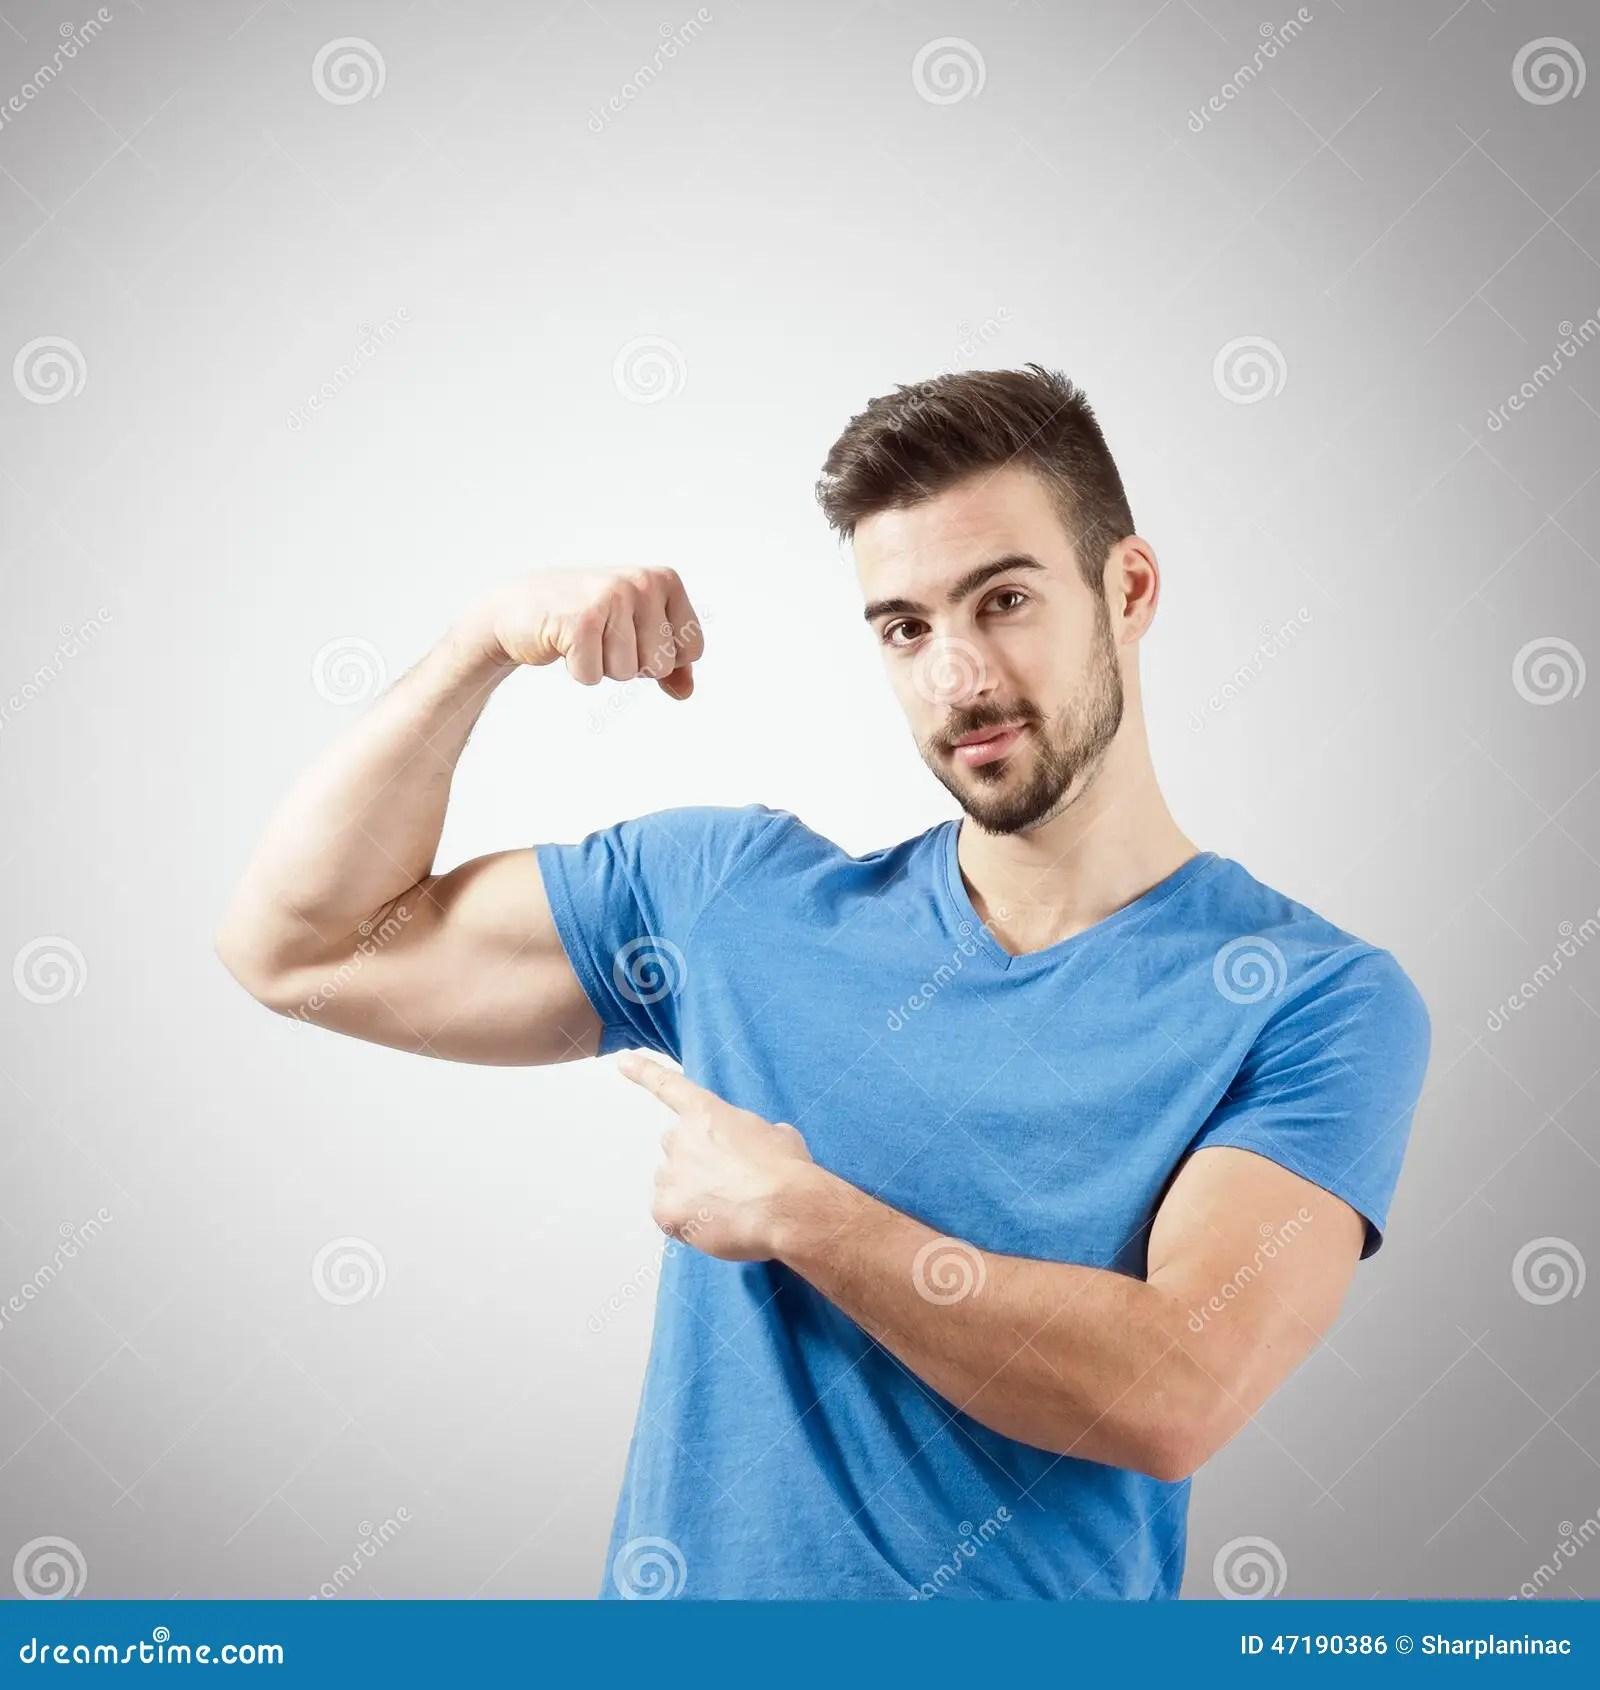 young man flexing biceps